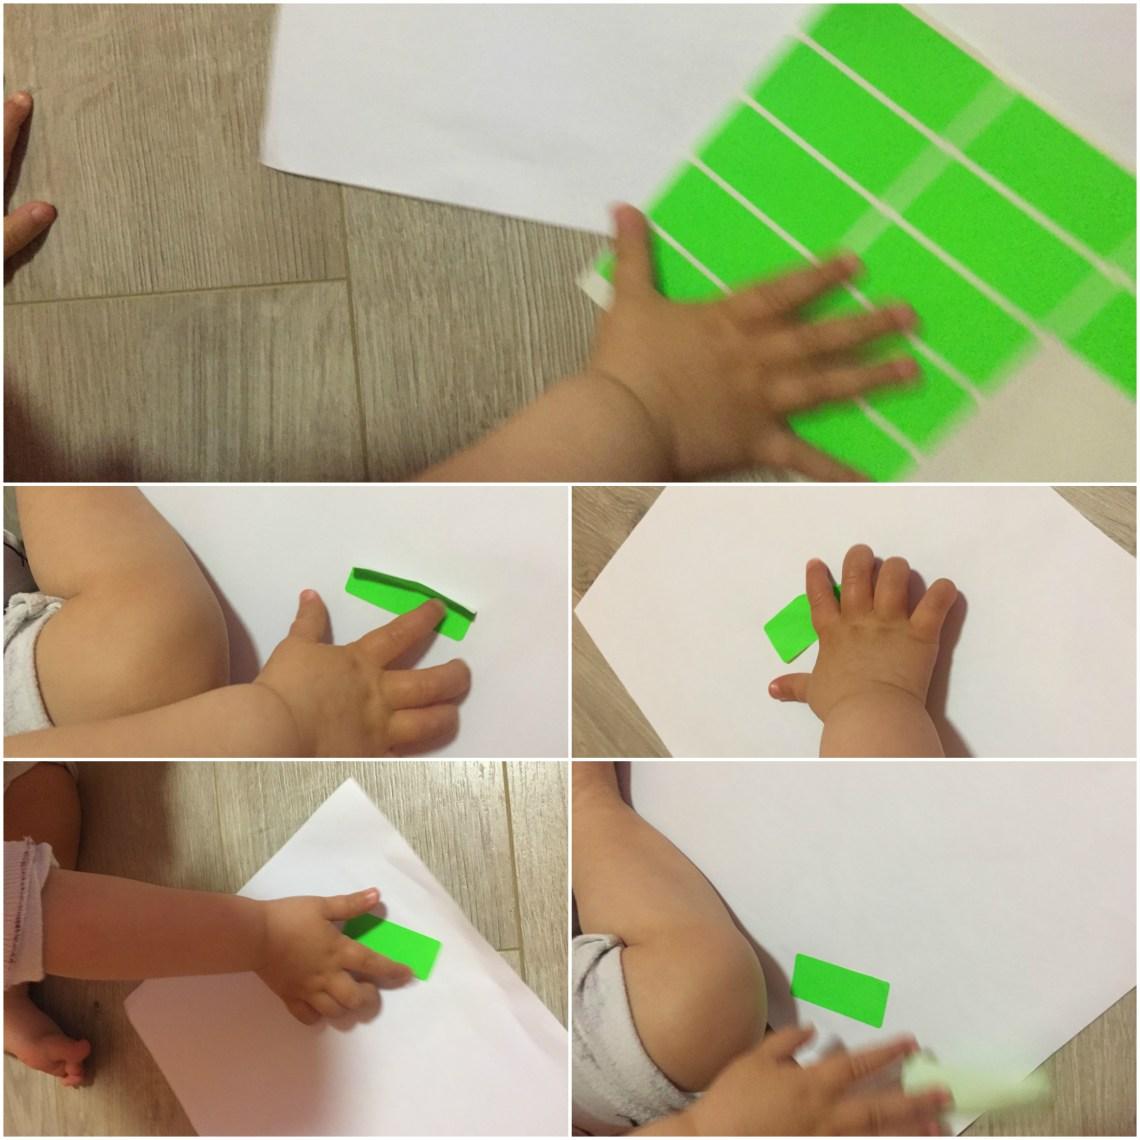 игра - залепяне на стикери